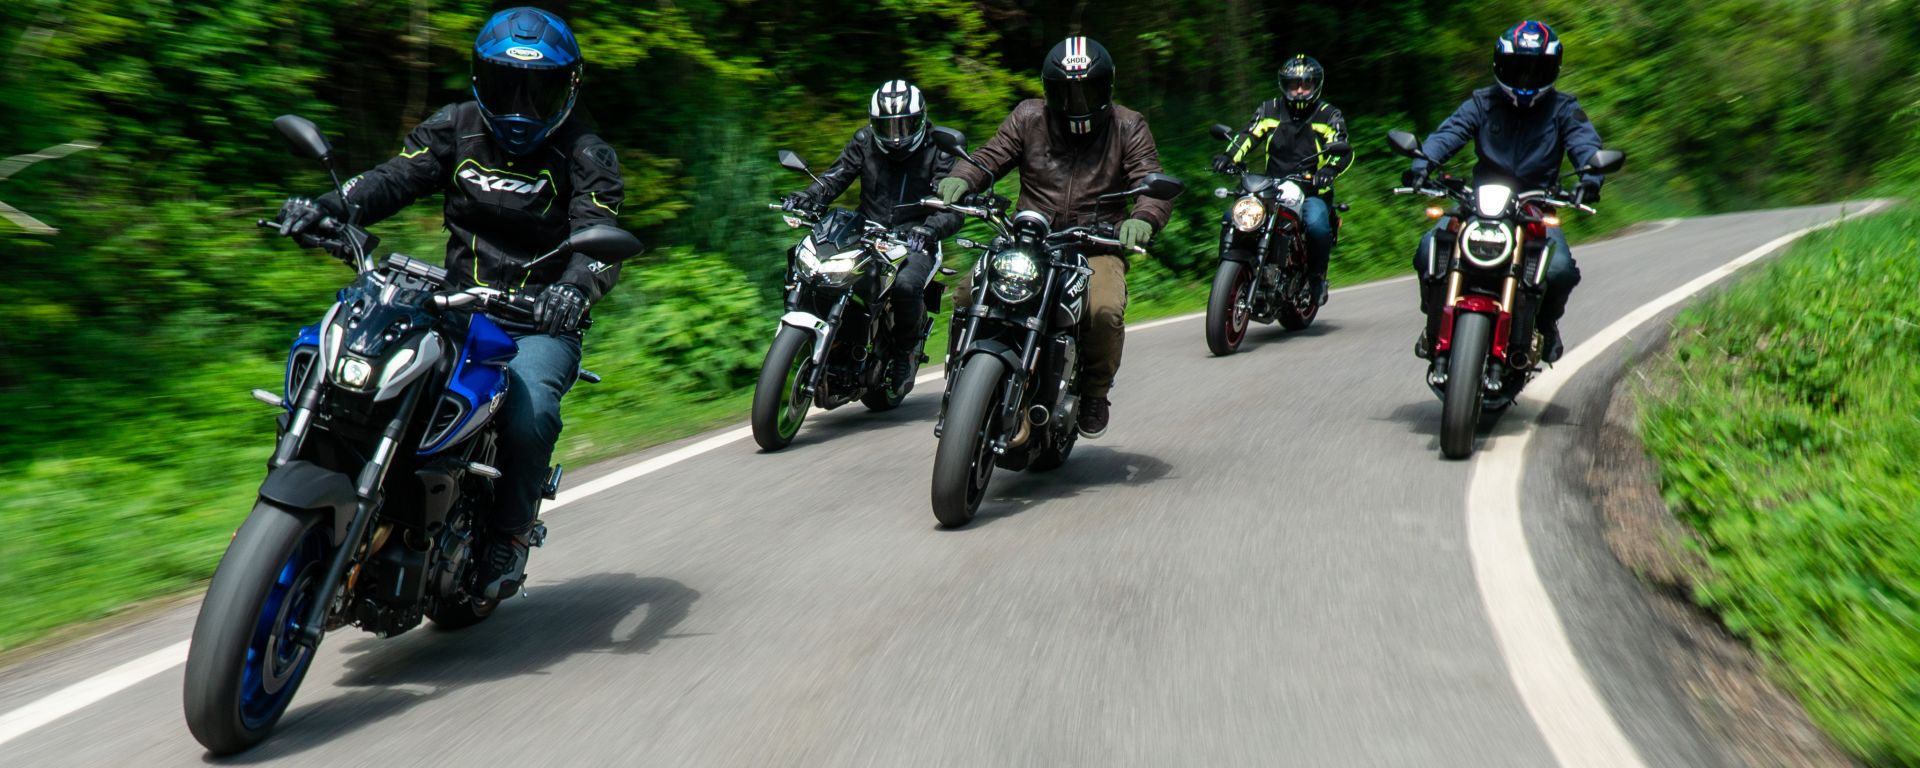 Comparativa naked entry level 2021: Honda CB650R, Kawasaki Z650, Suzuki SV650, Triumph Trident 660, Yamaha MT-07